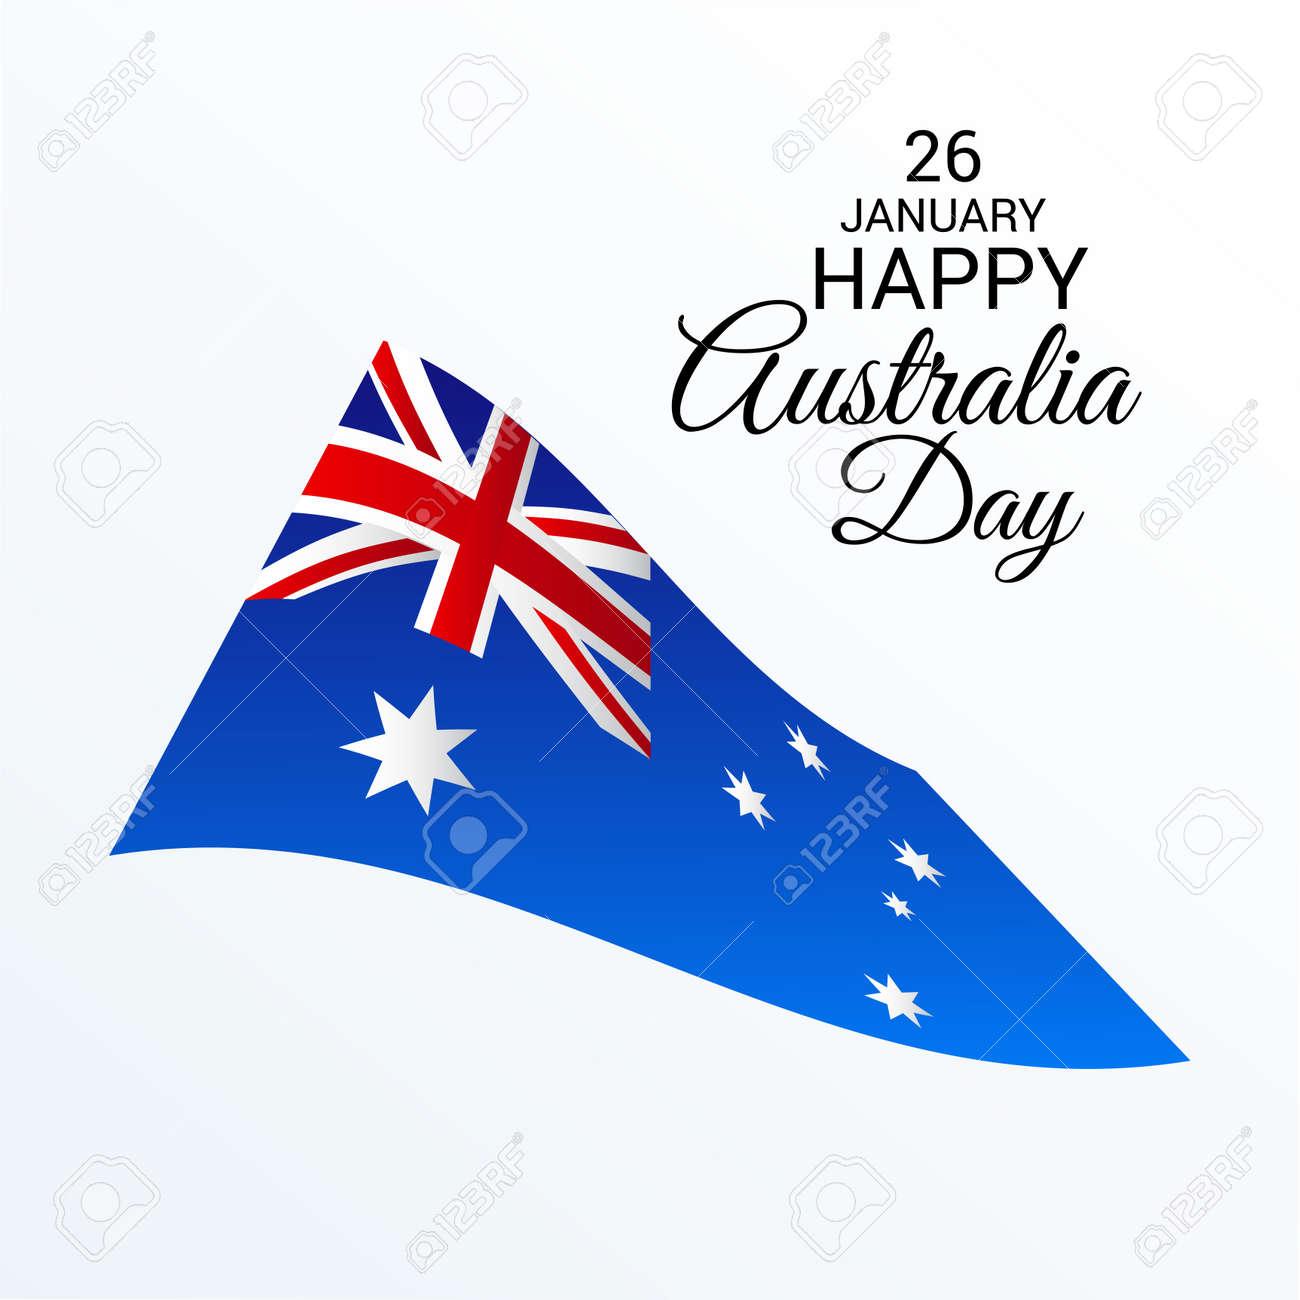 Happy Australia Day Greeting Card With Australian Flag Design